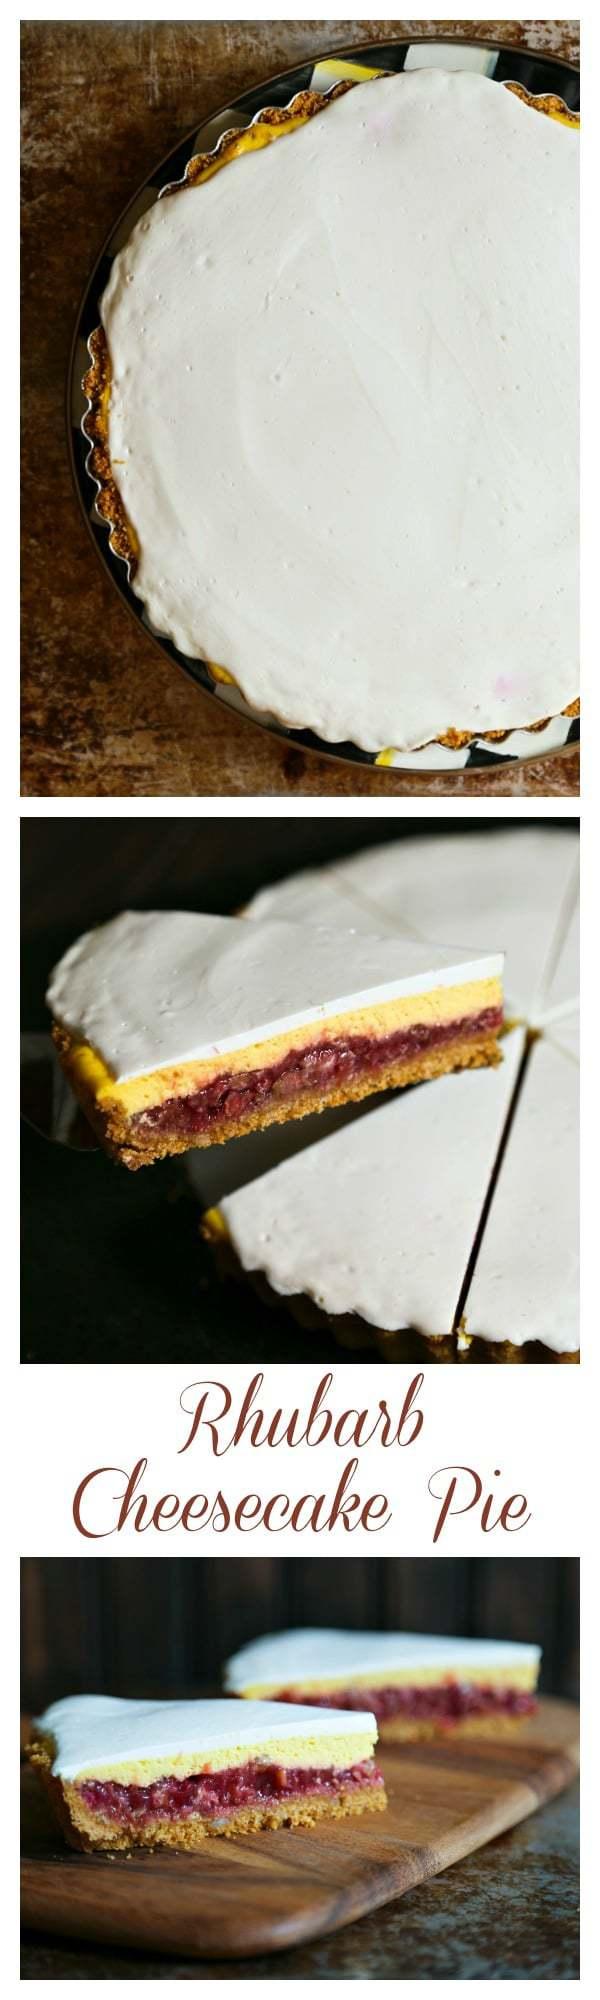 Rhubarb Cheesecake Pie for #DairyMOOnth